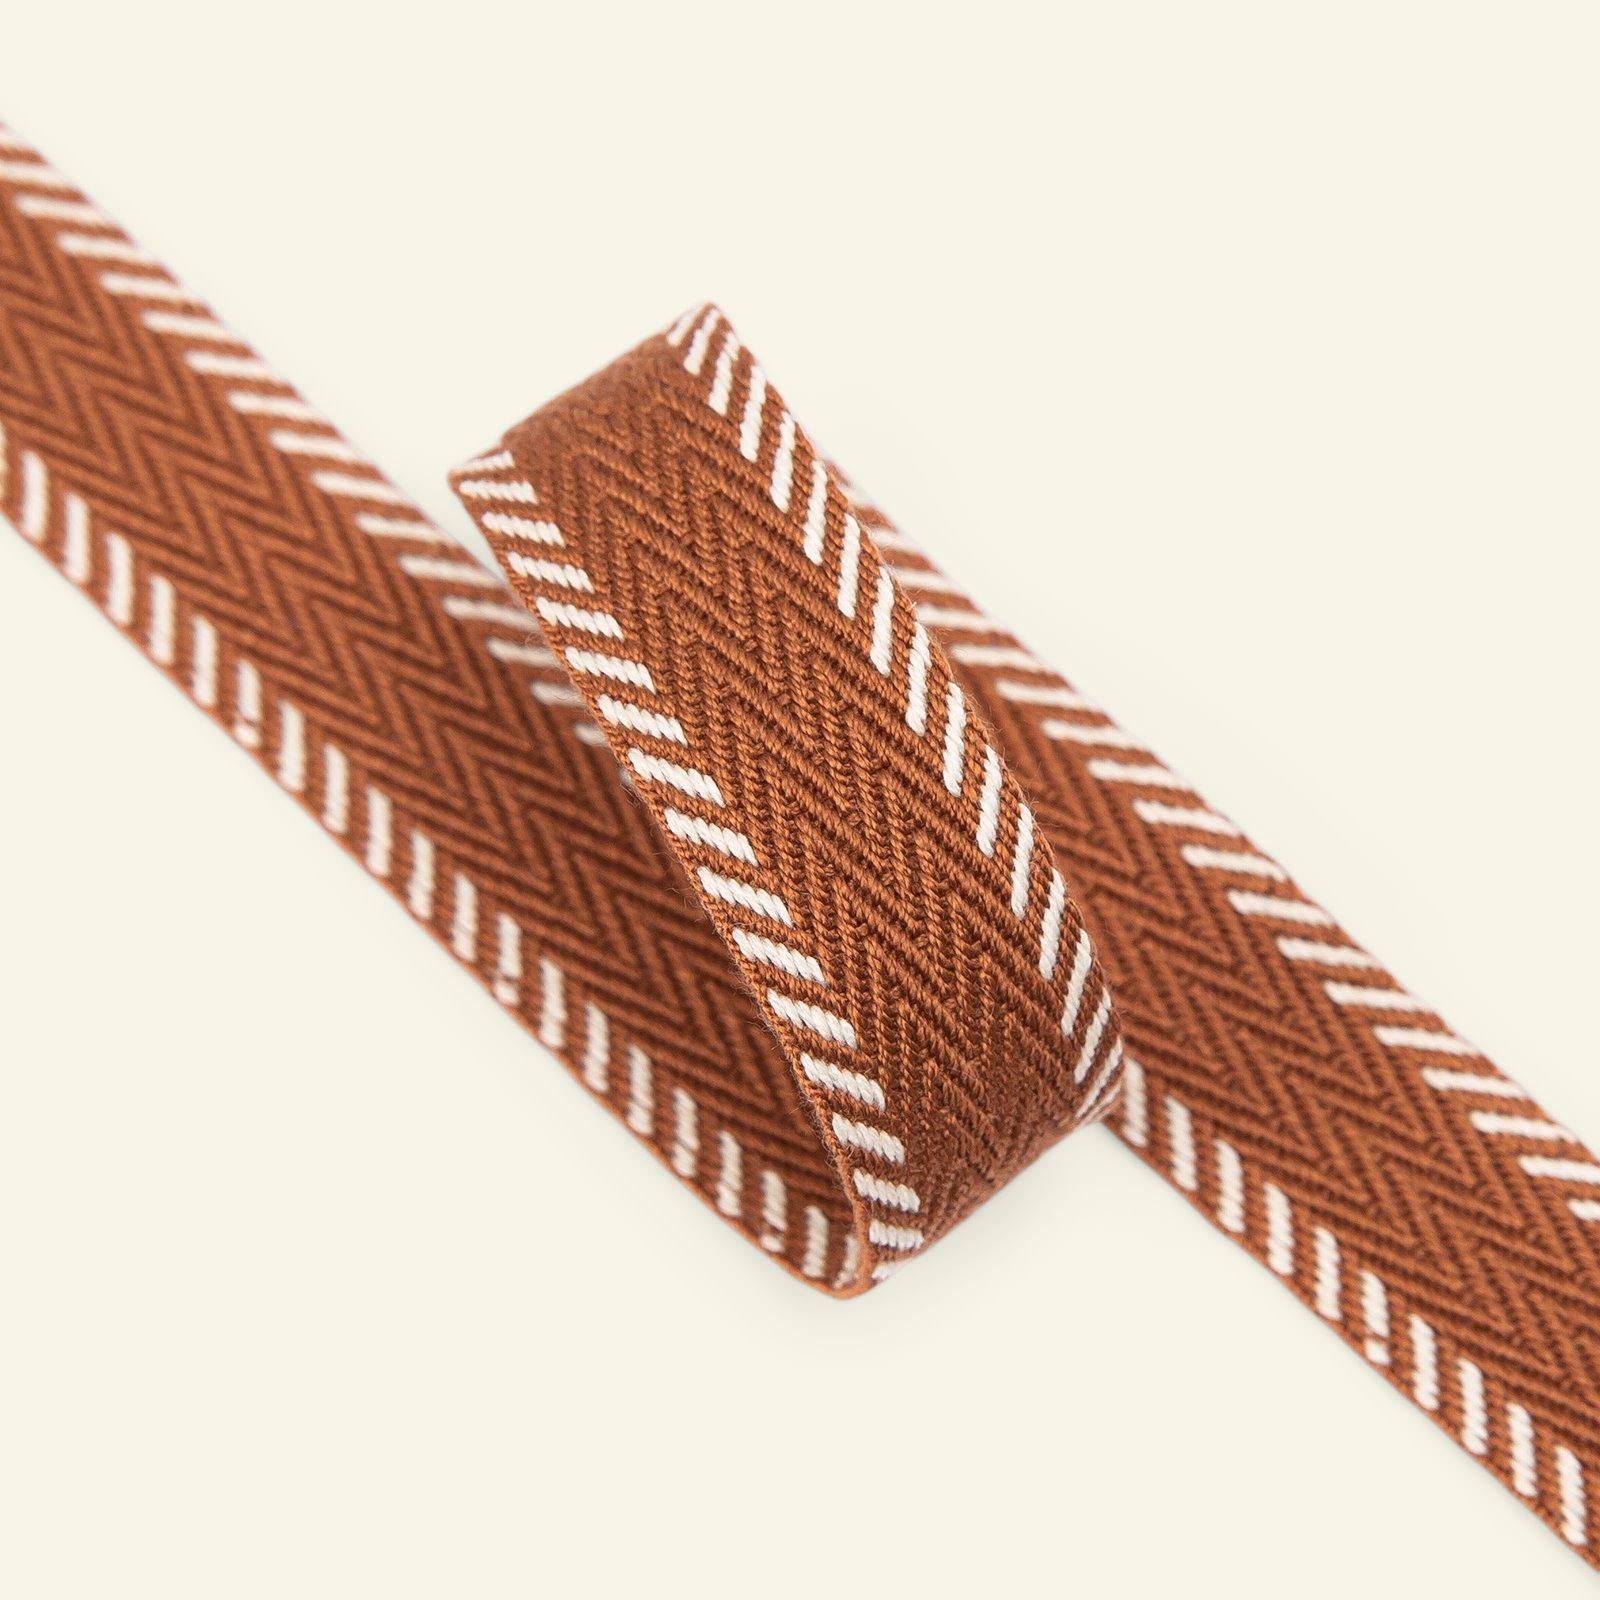 Gurtband 20mm Braun, 2m 22223_pack